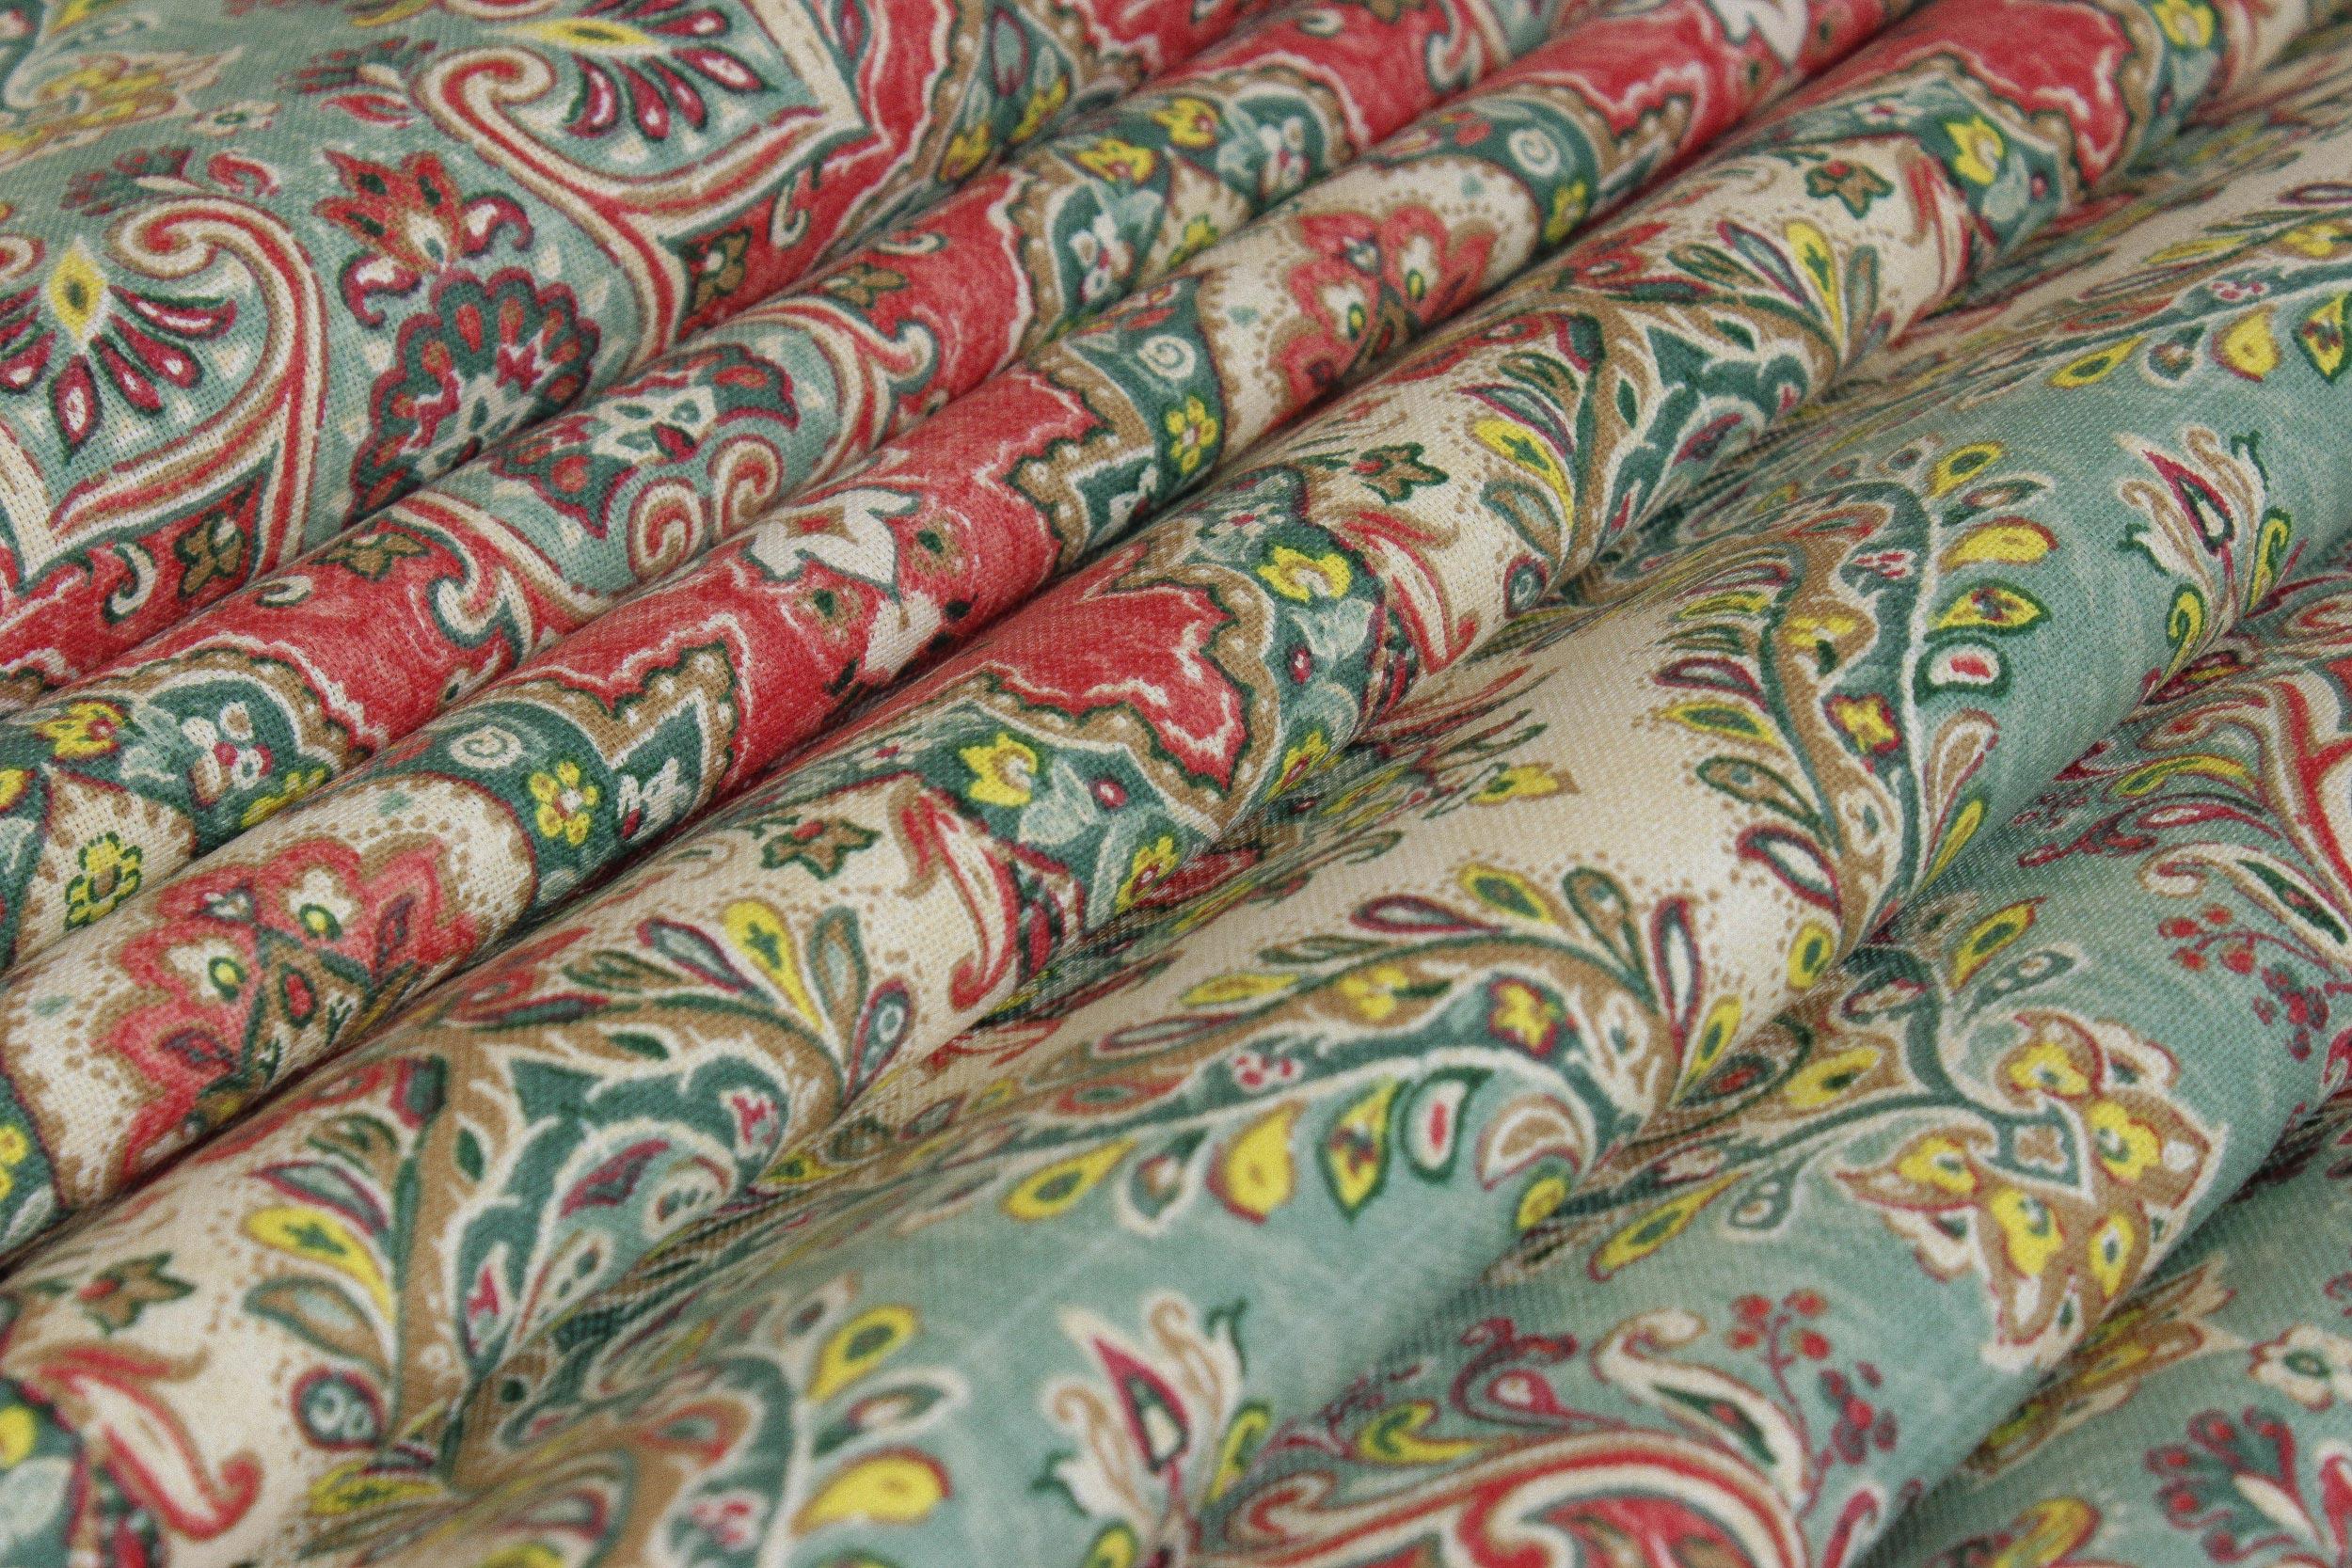 Waverly Palace Sari Jewel The Fabric Mill